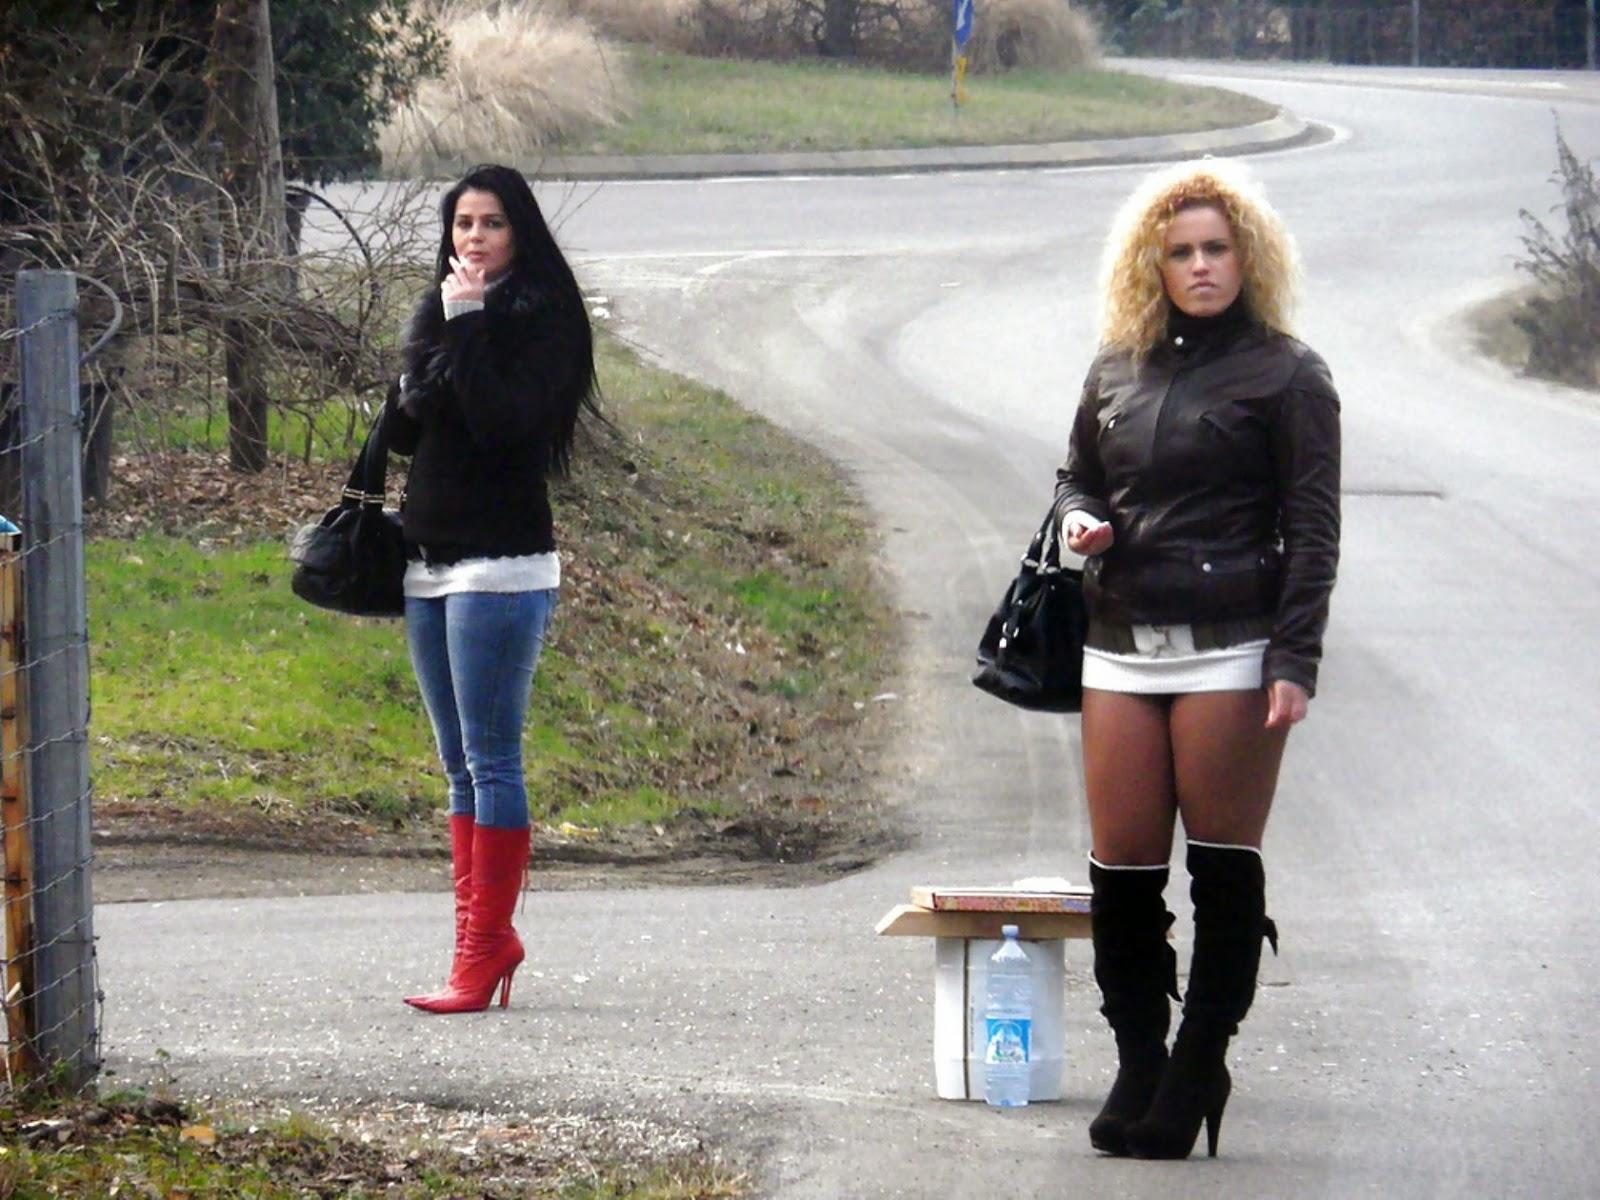 prostitutas grabadas en la calle prostitutas en paris